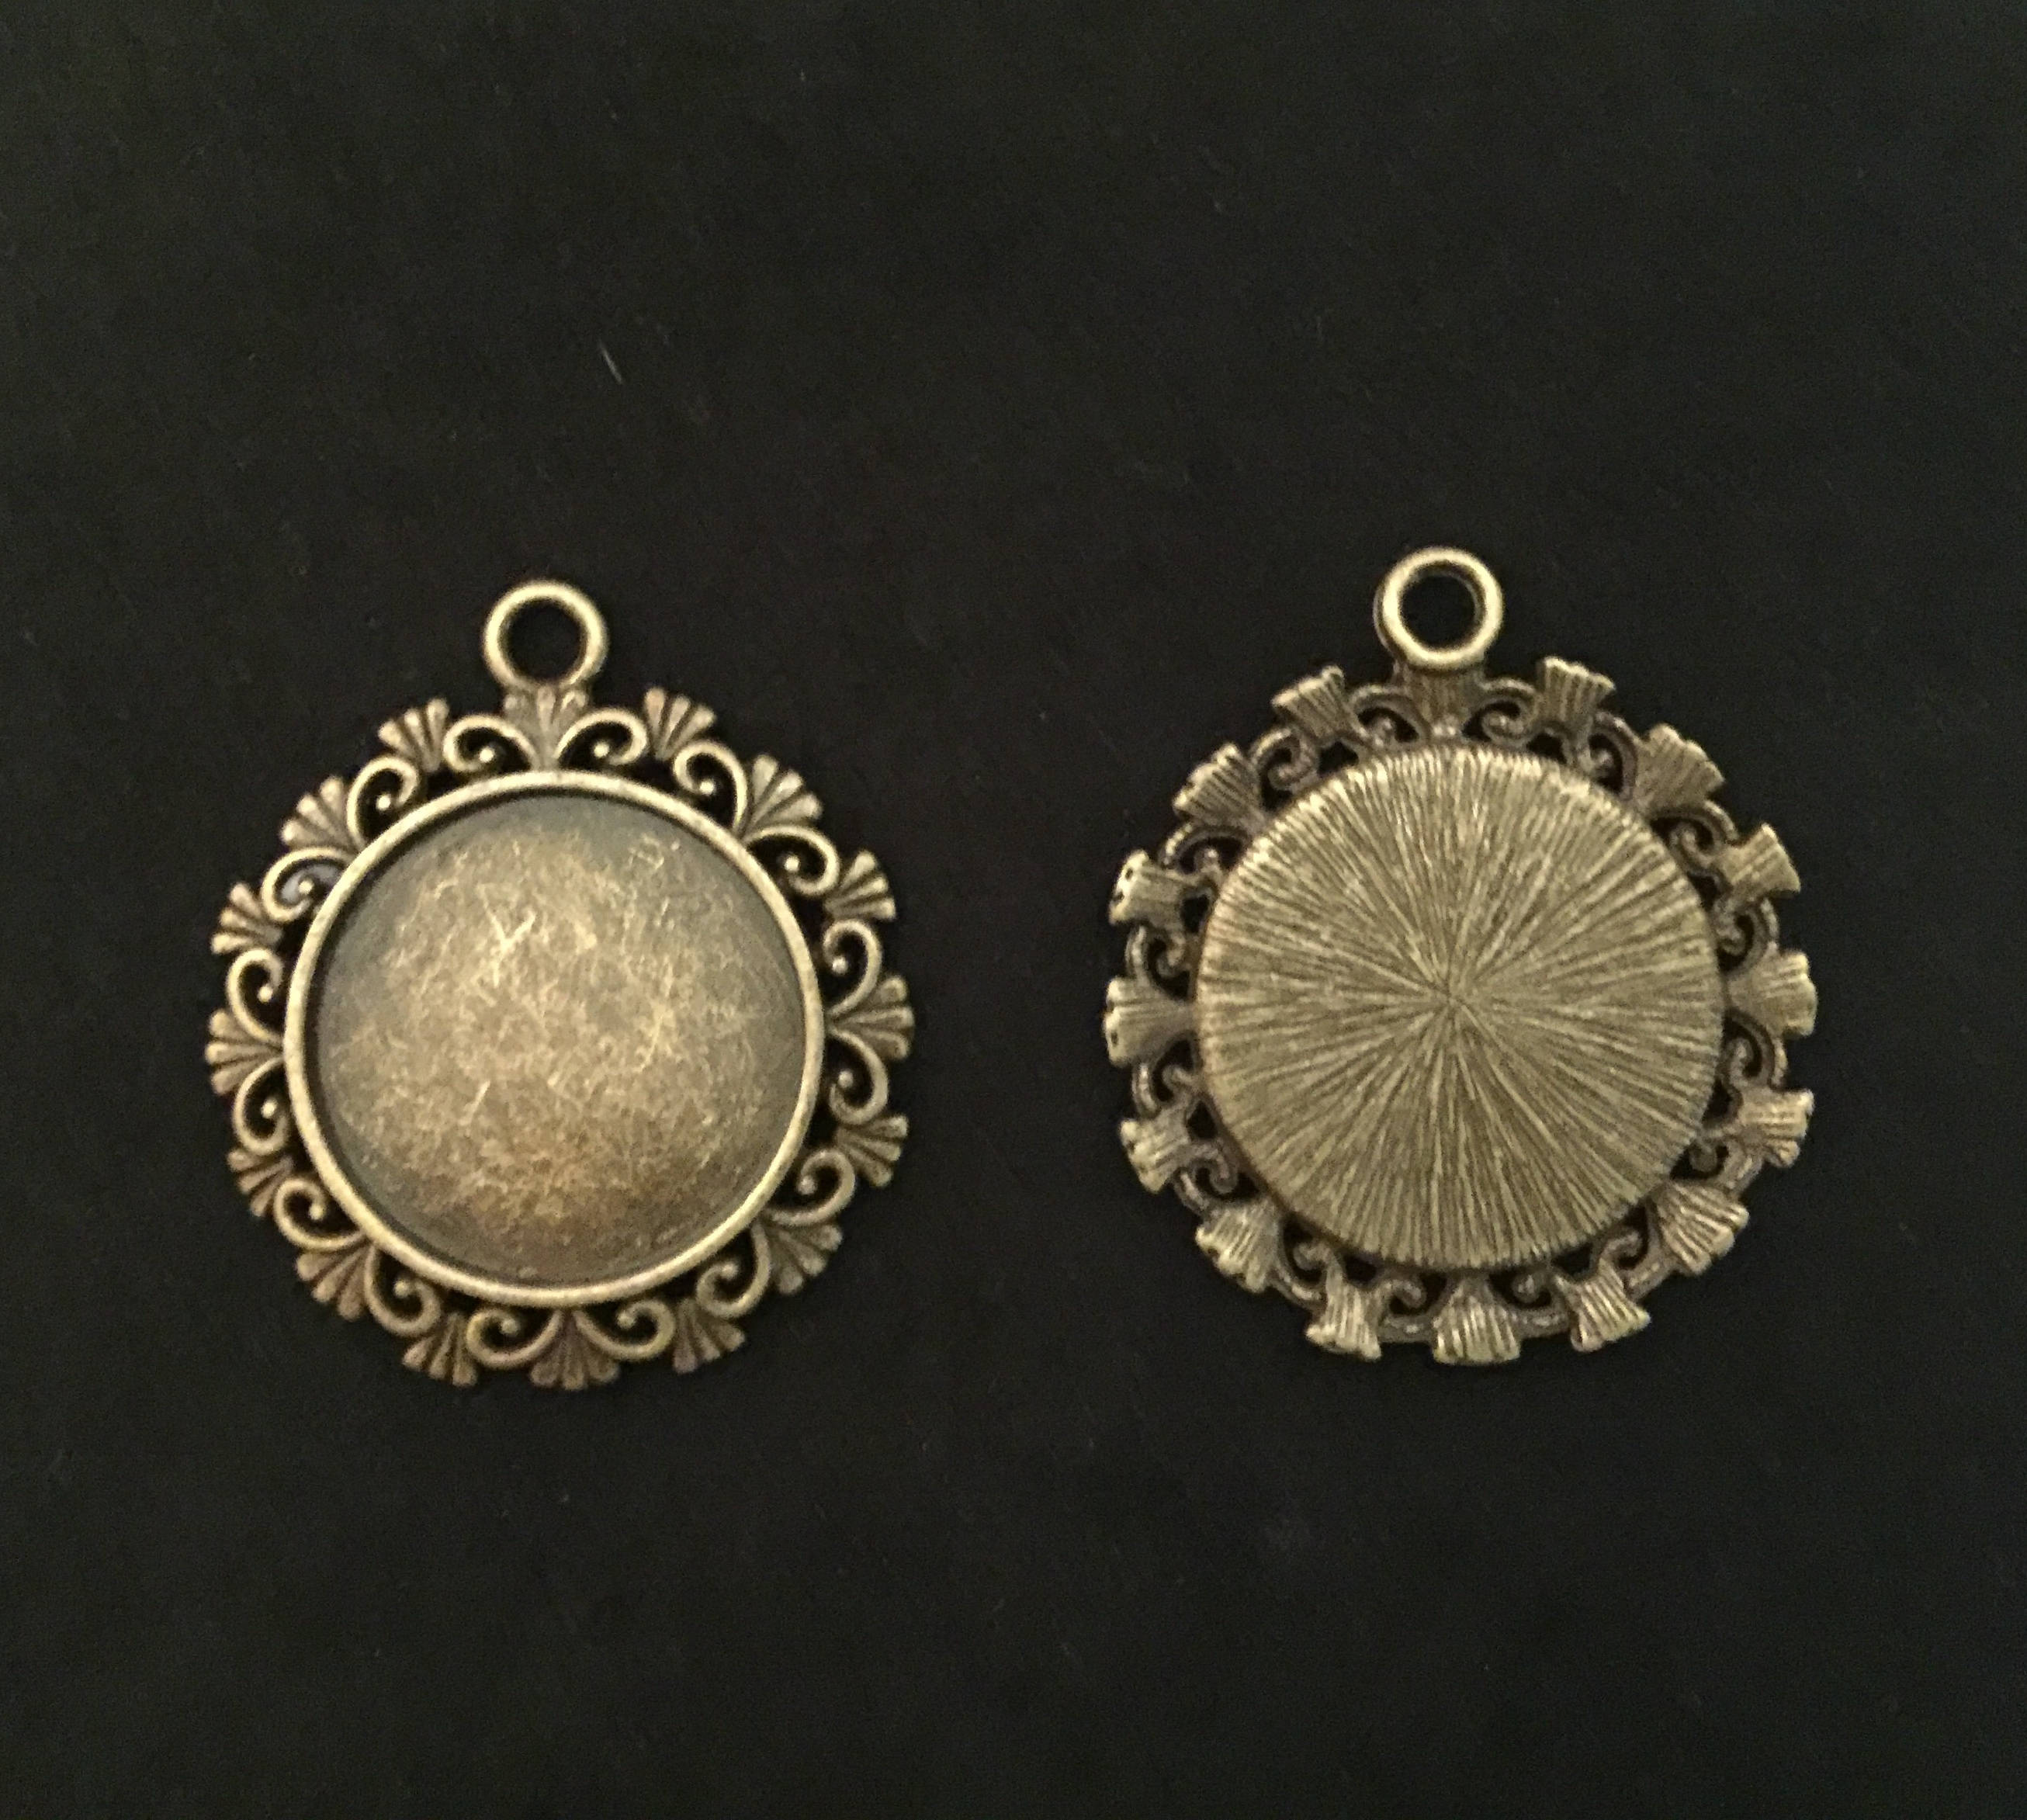 Pendentif, support pendentif,pendentif cabochon, cabochon pendant, support pendant, Joce150652creaconcep, cabochon 20 mm, support bronze